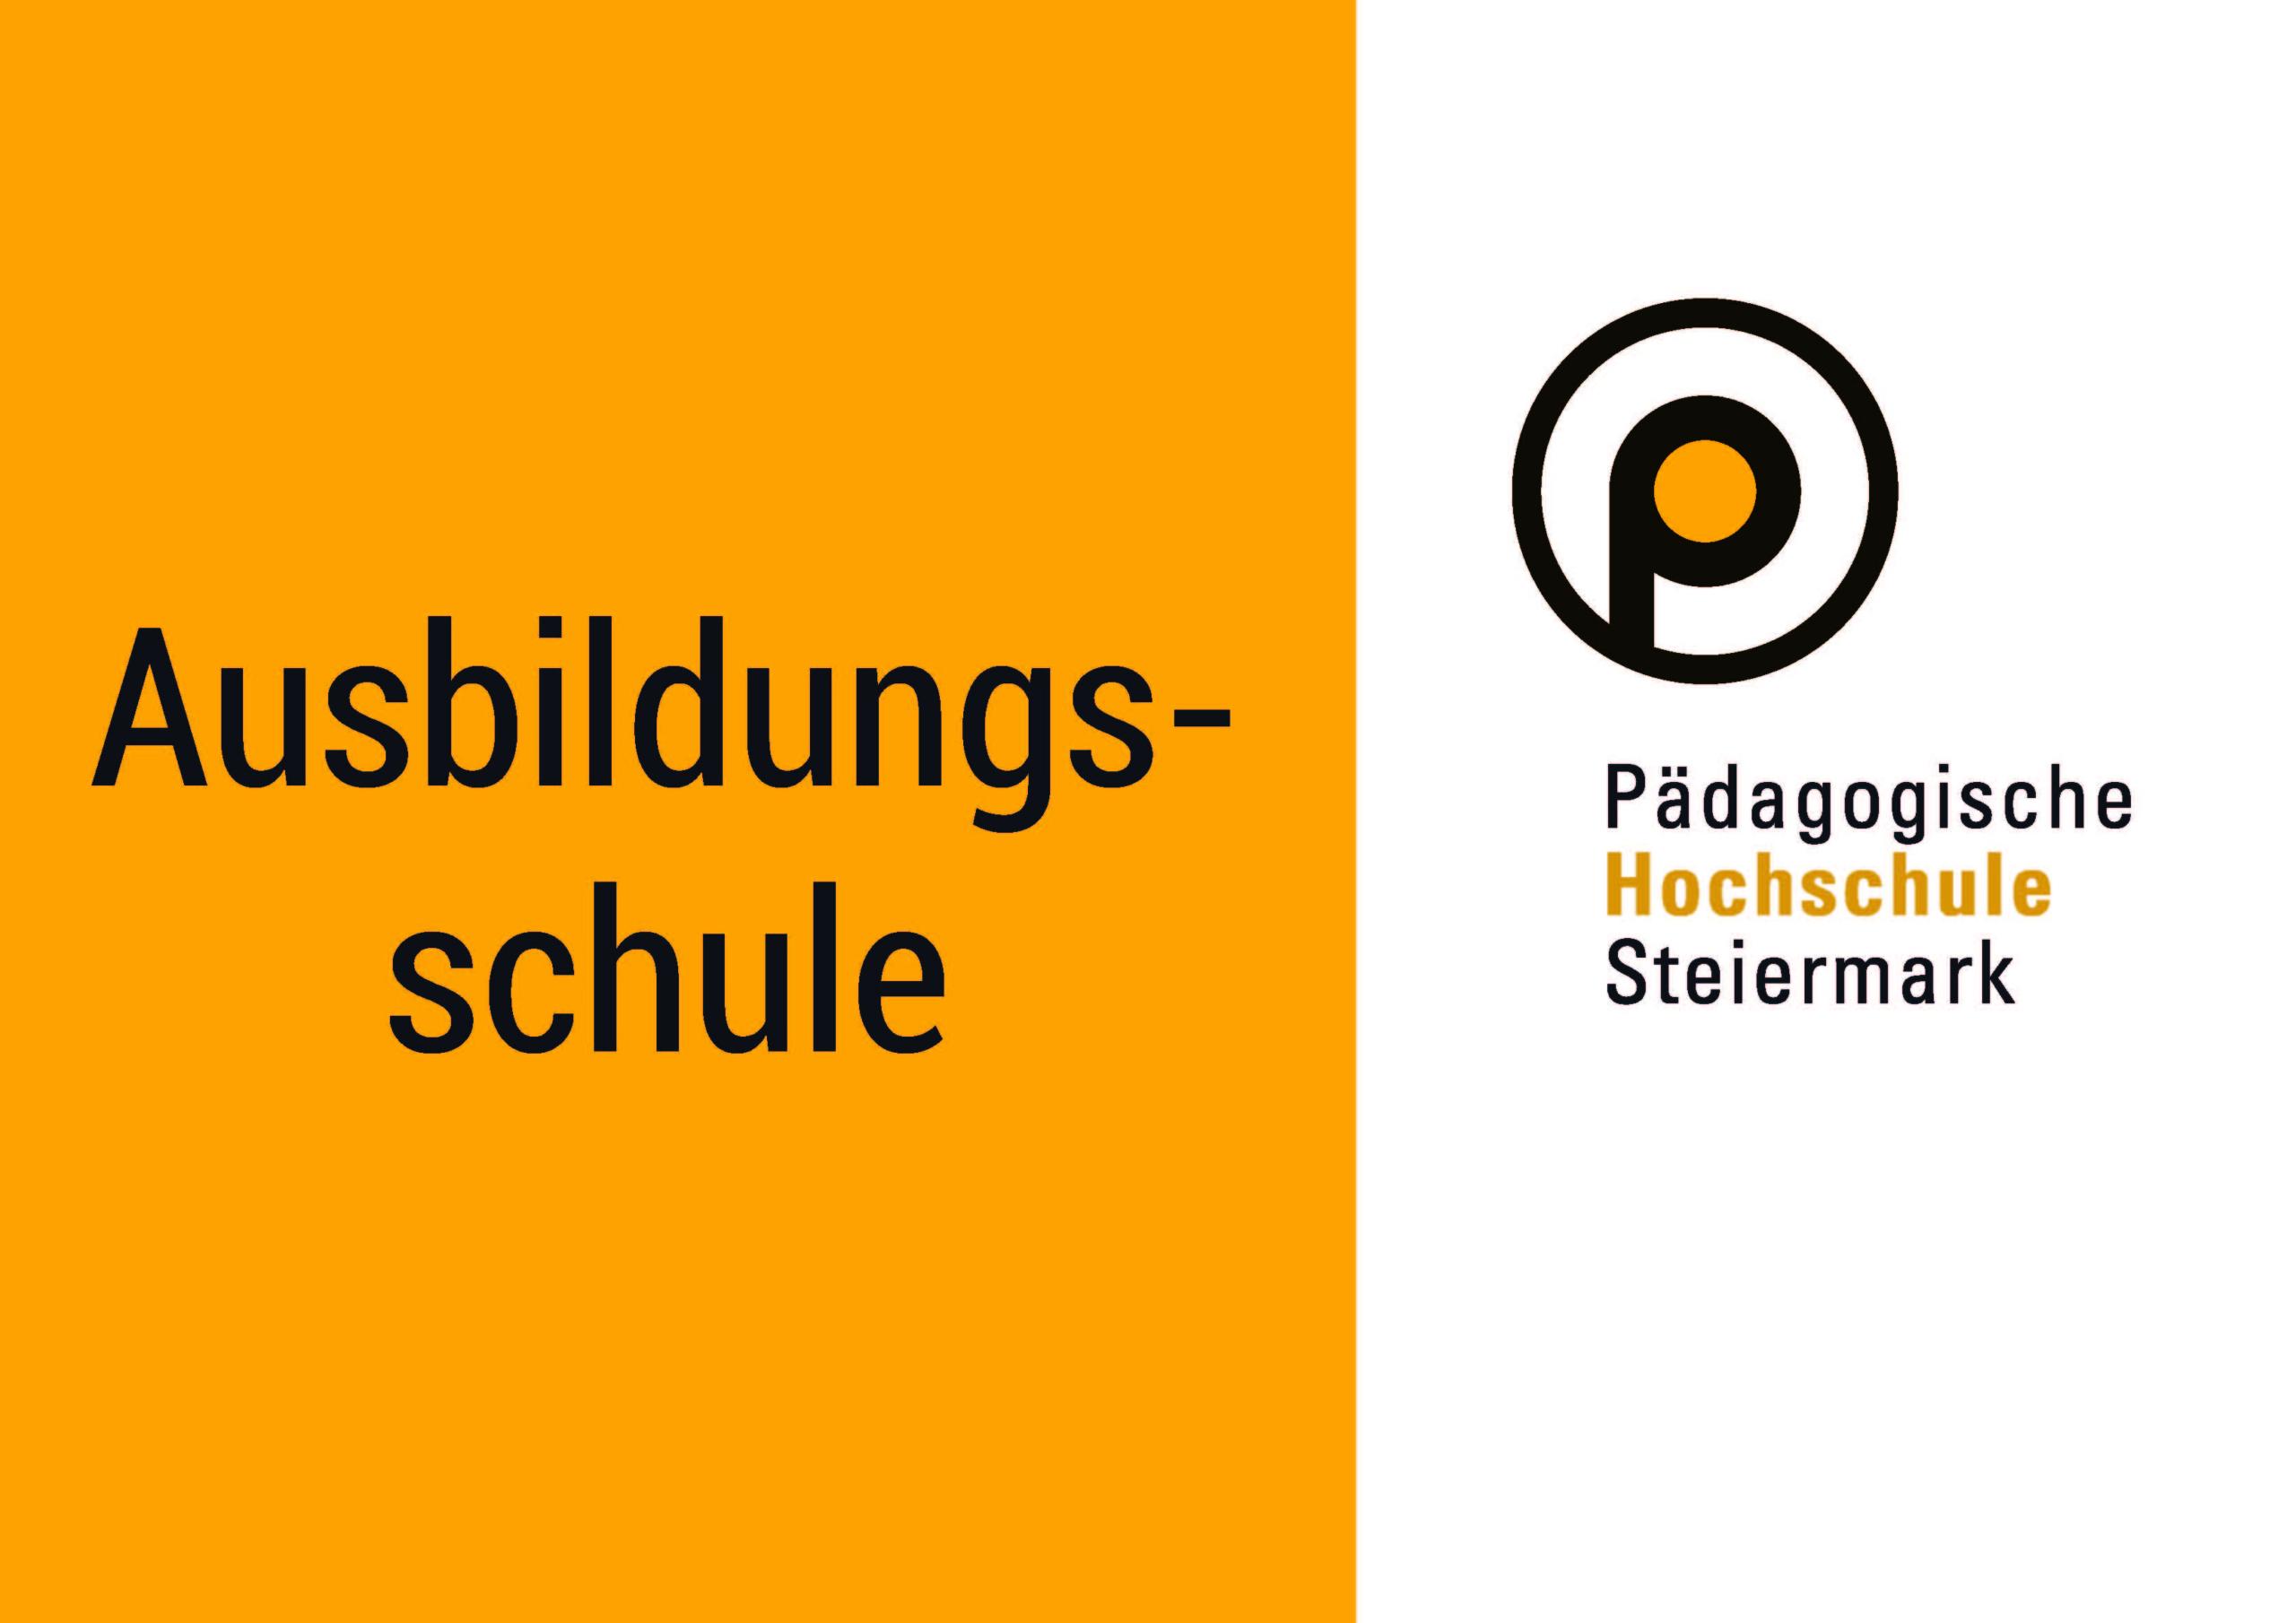 Zertifikat Ausbildunsgschule der Pädagogischen Hochschule